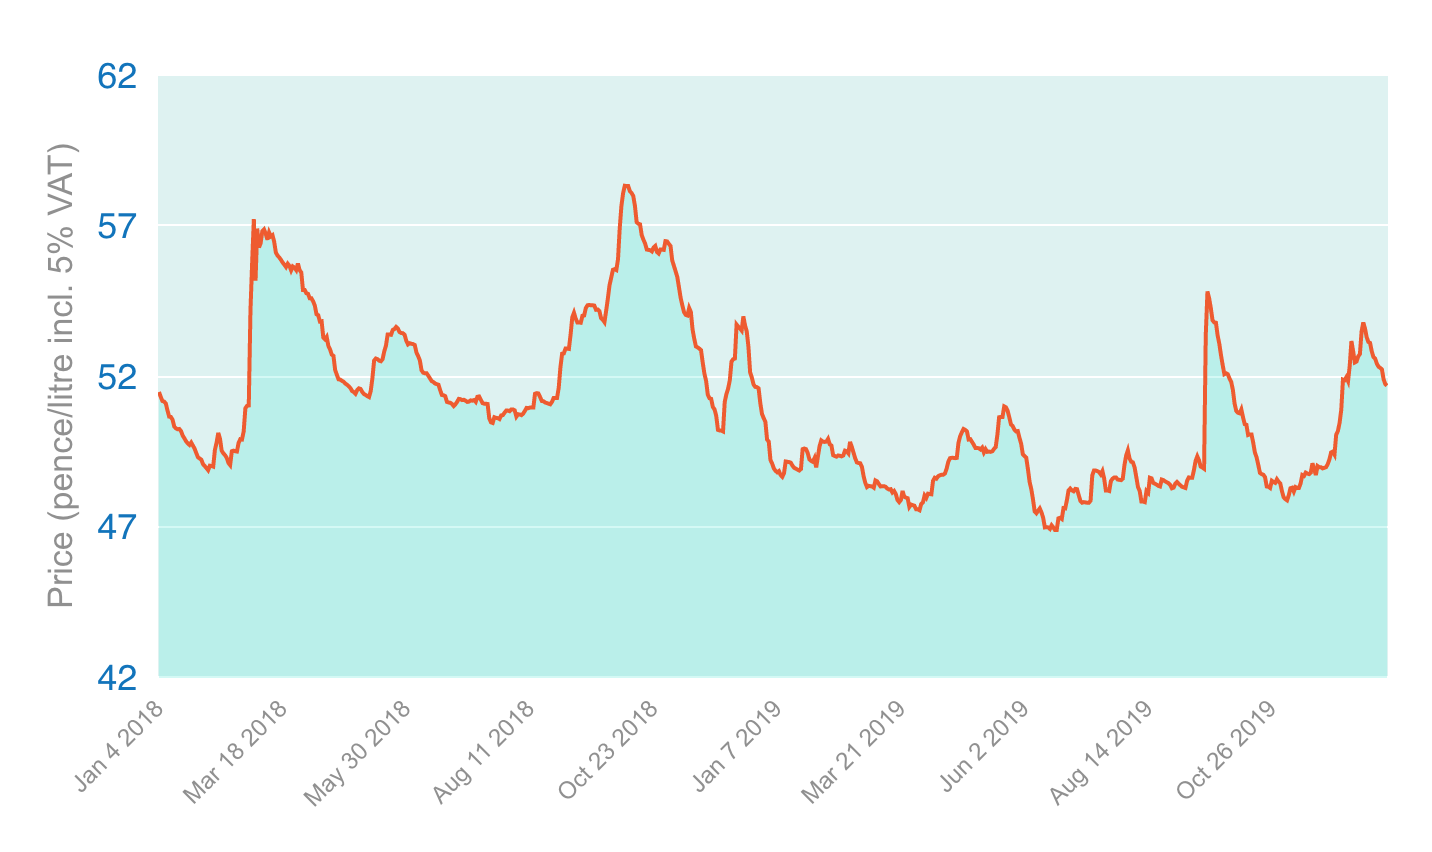 BoilerJuice heating oil chart (Dec 2019)